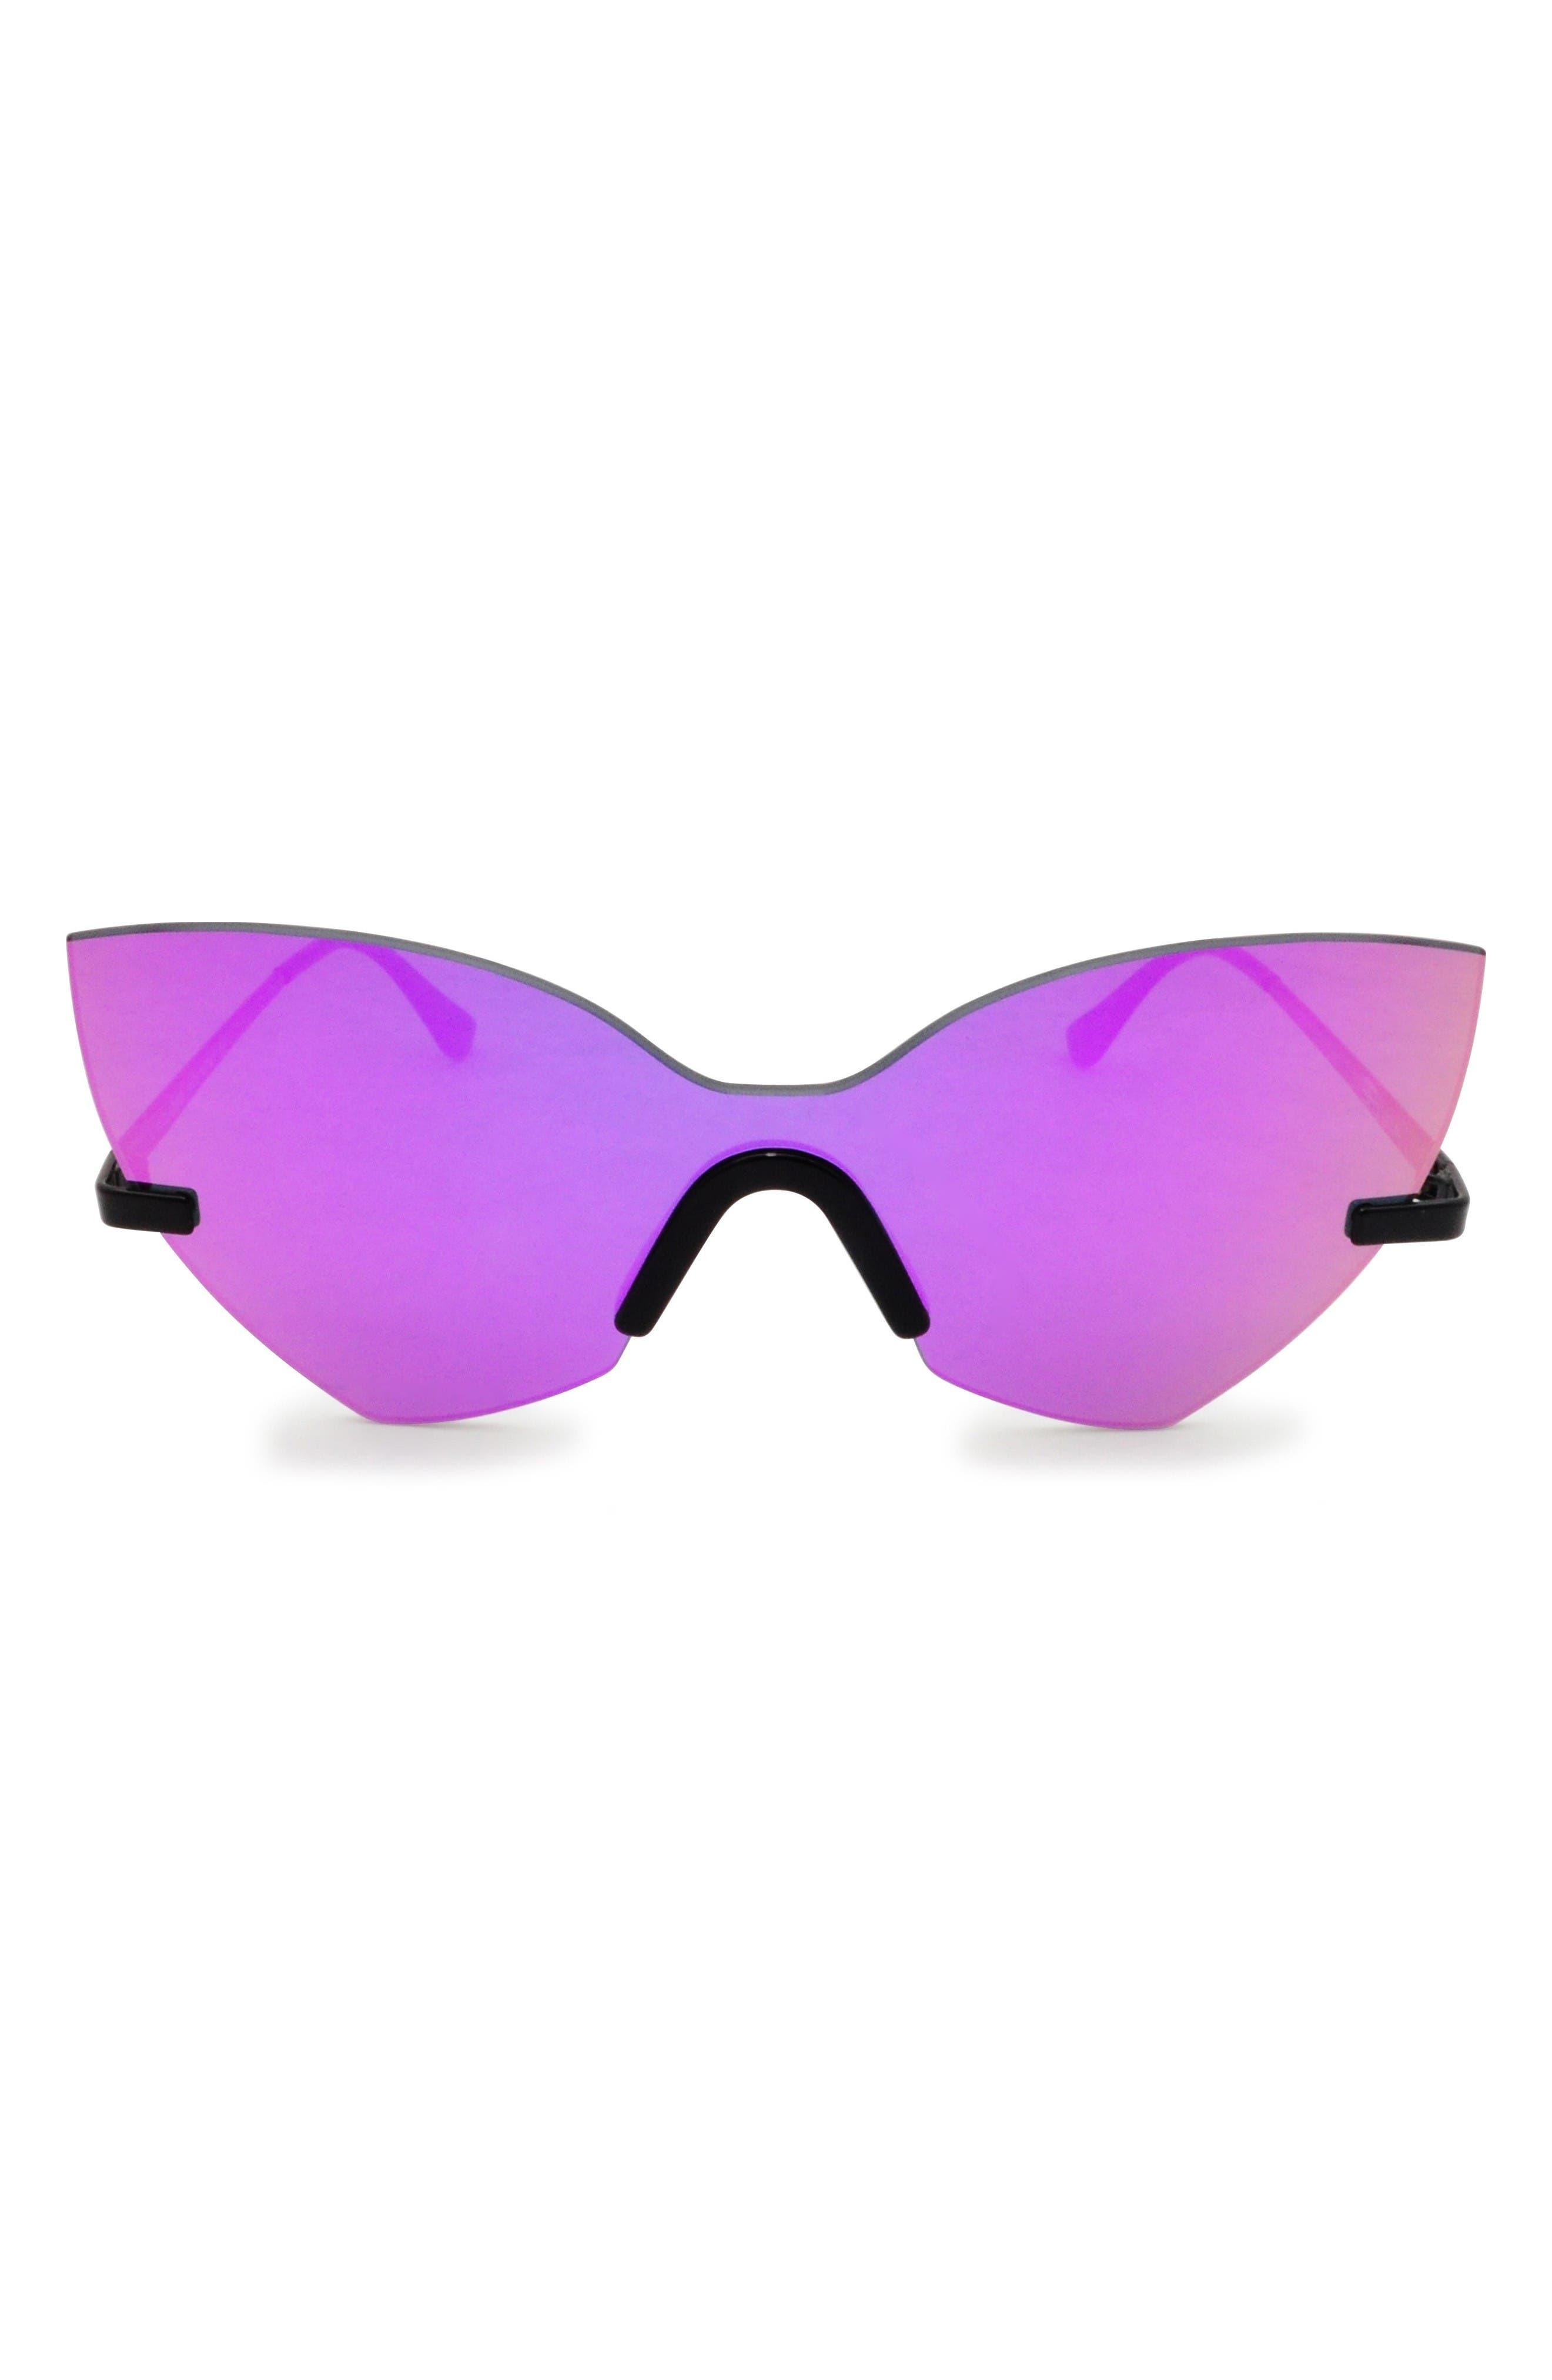 Alternate Image 1 Selected - GLASSING 55mm Cat Eye Shield Sunglasses